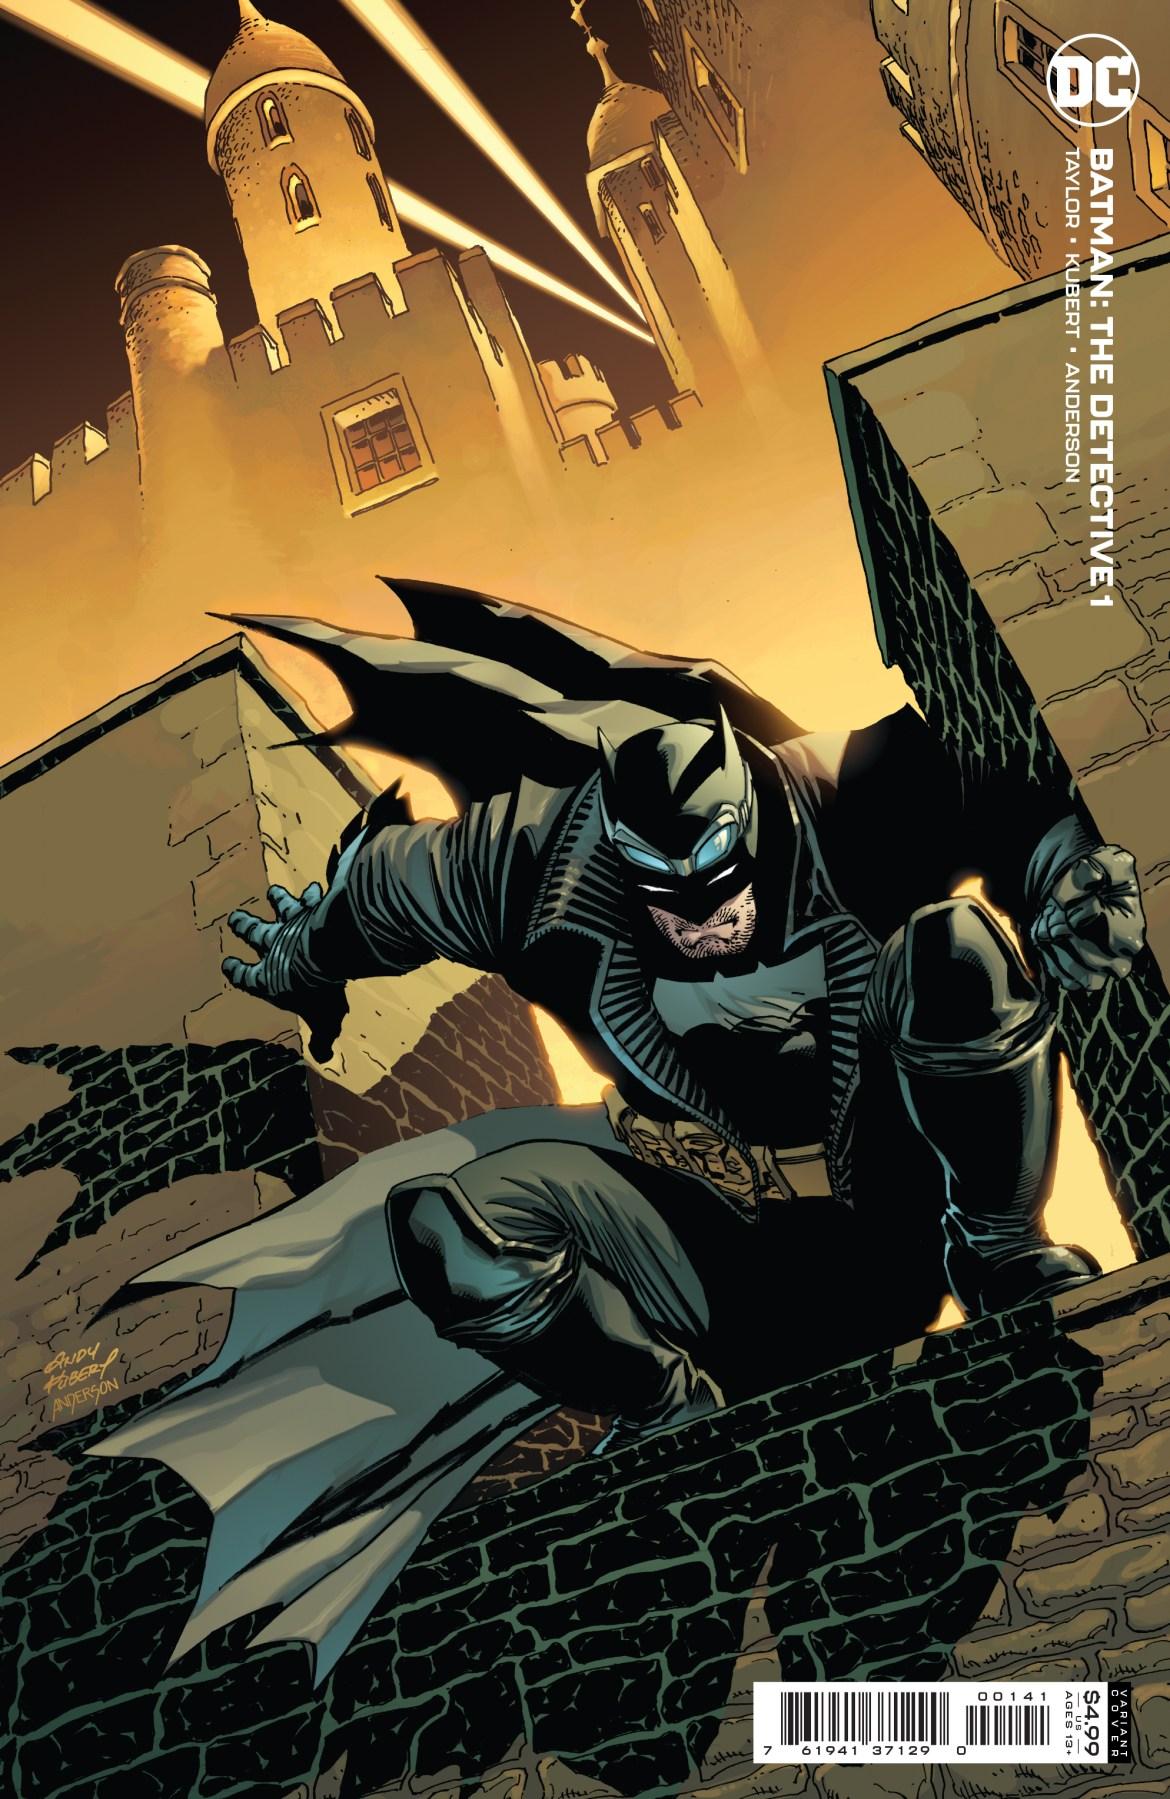 0221DC009 ComicList: DC Comics New Releases for 04/14/2021